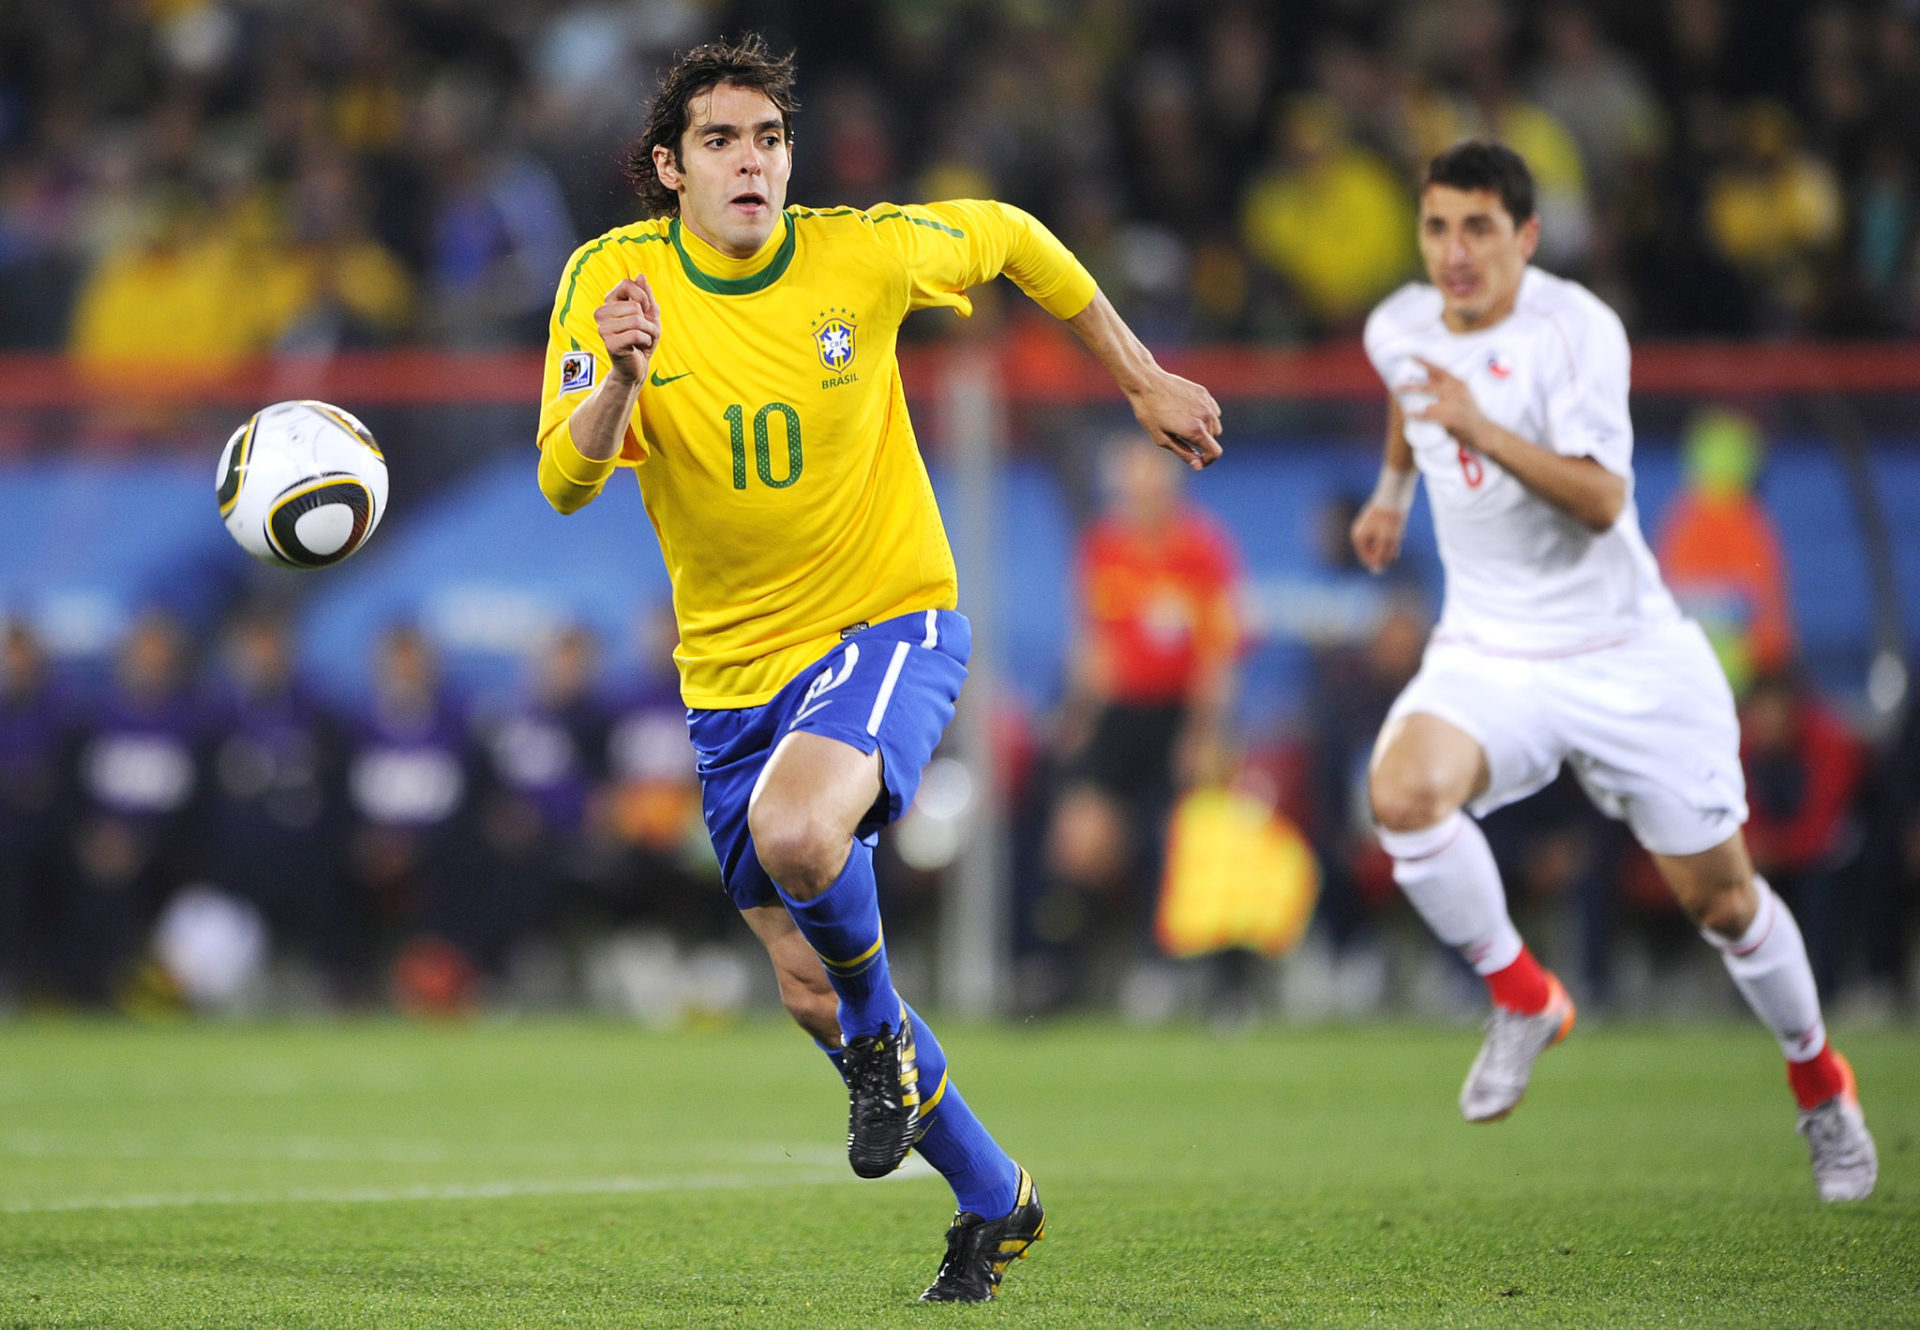 the best Brazilian players